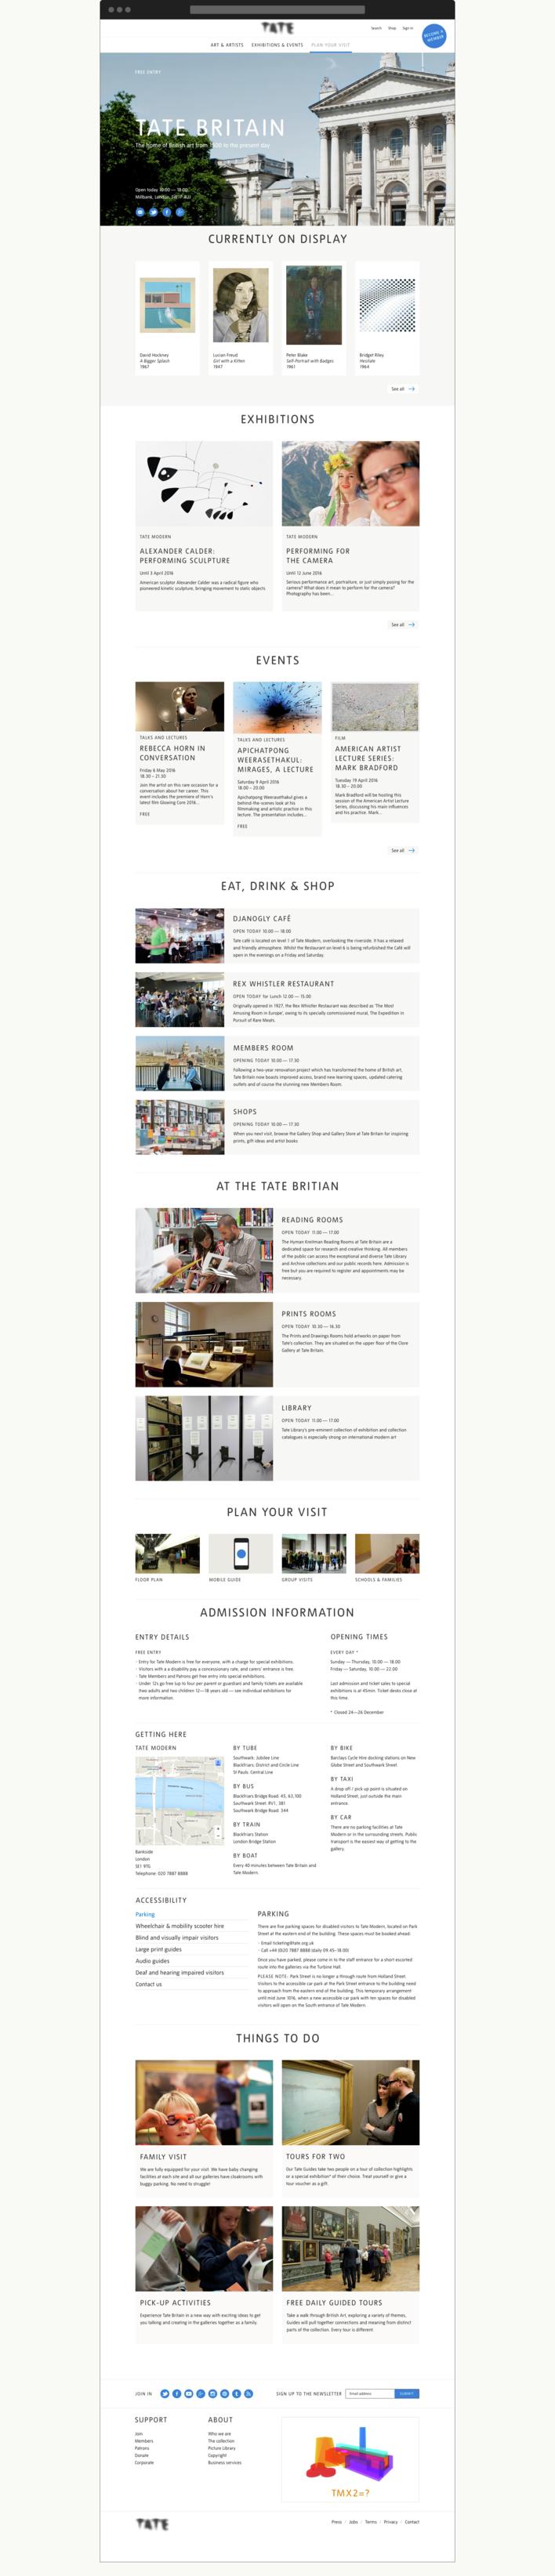 Tate venue page